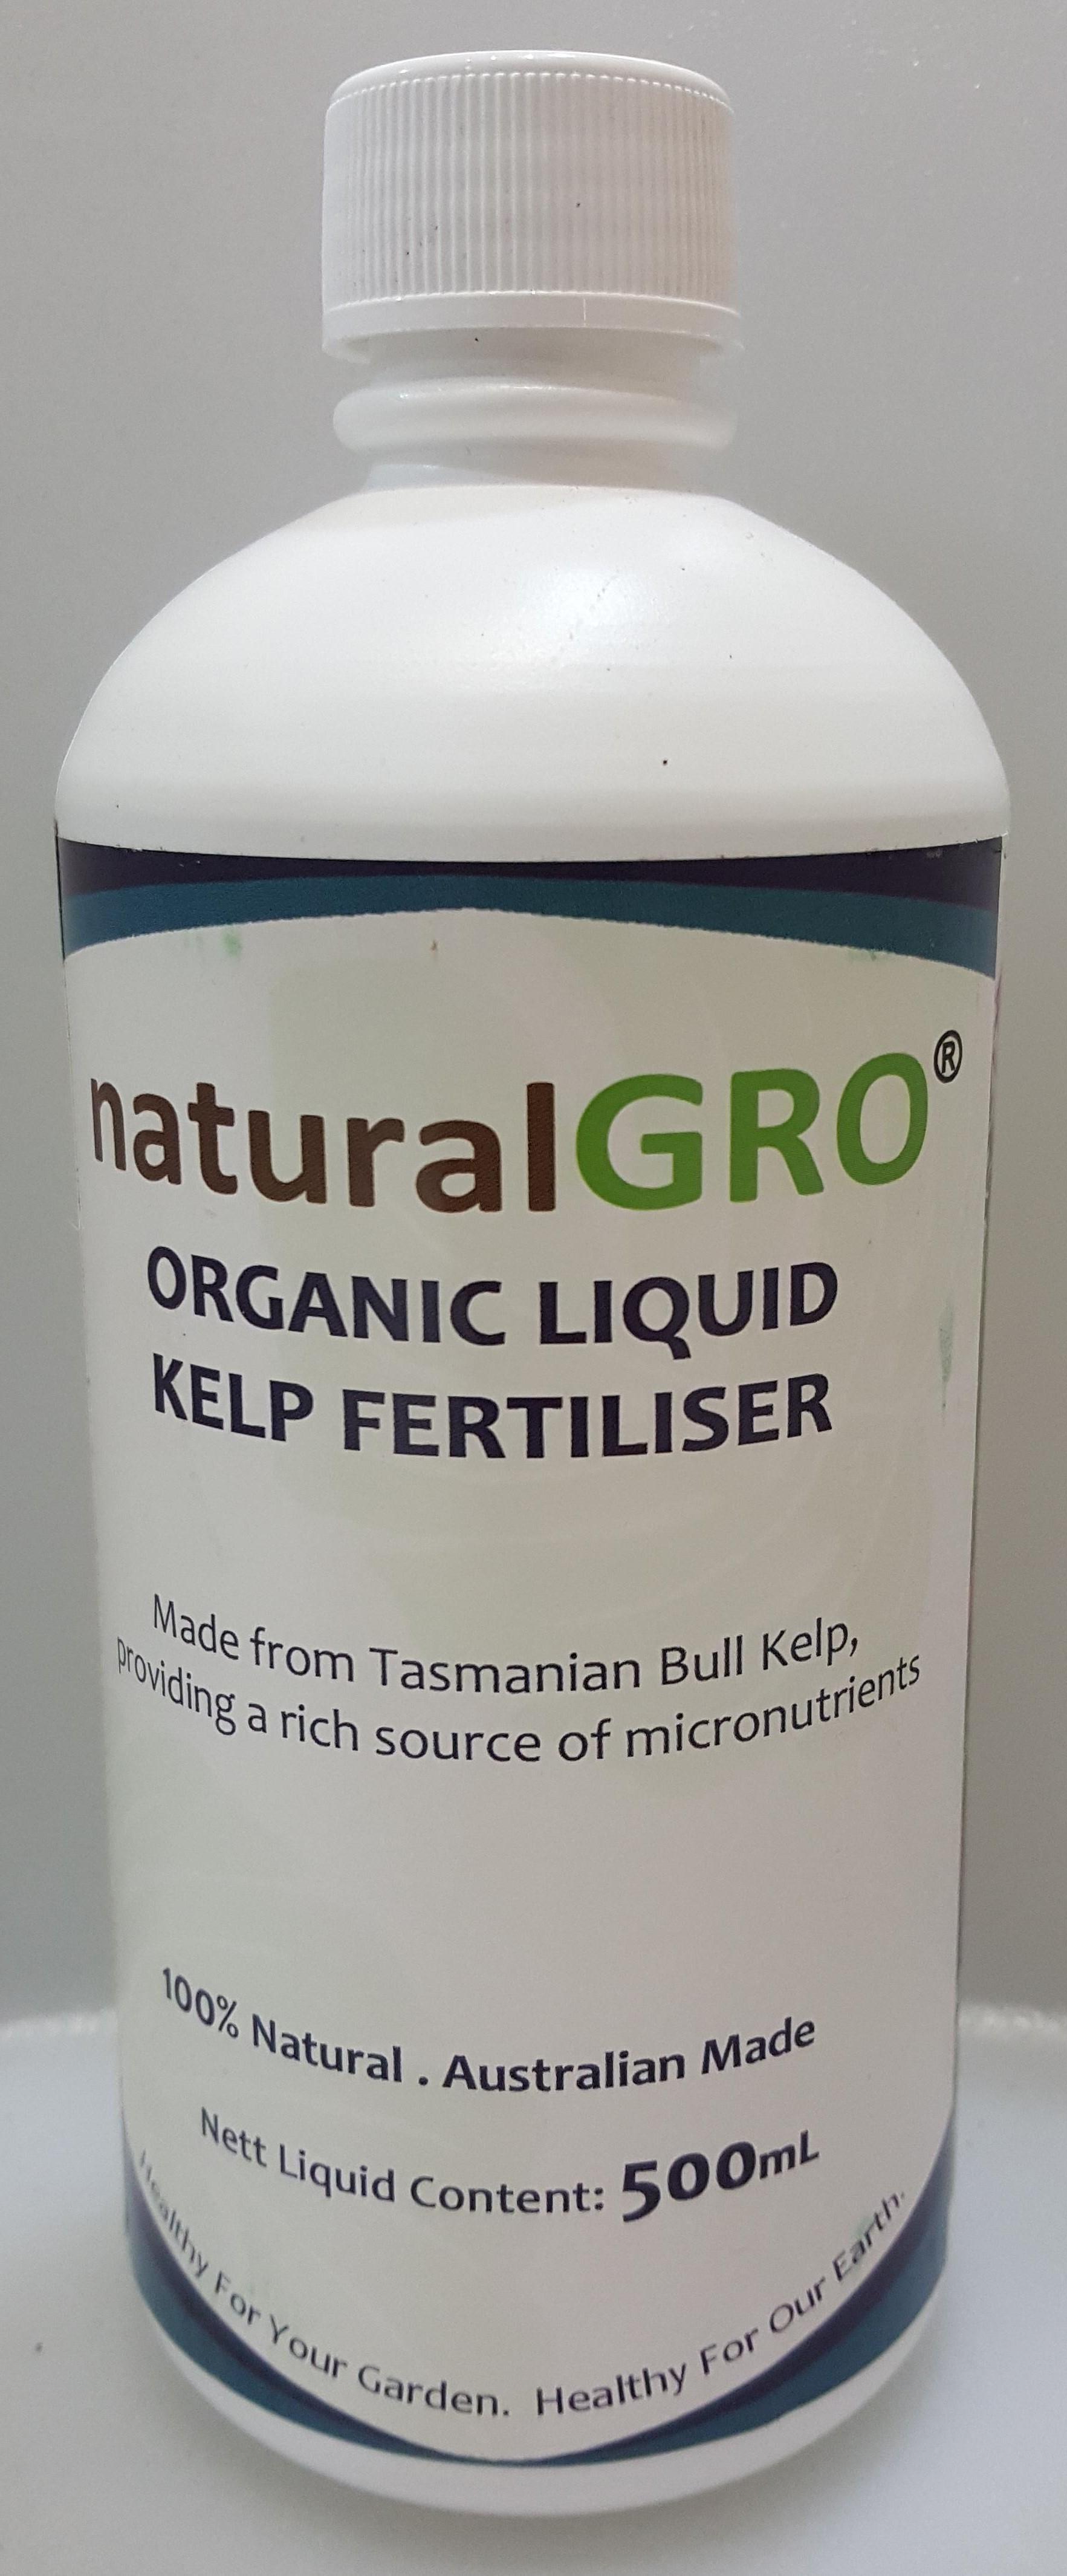 naturalGRO Organic Liquid Kelp Fertiliser 500mL